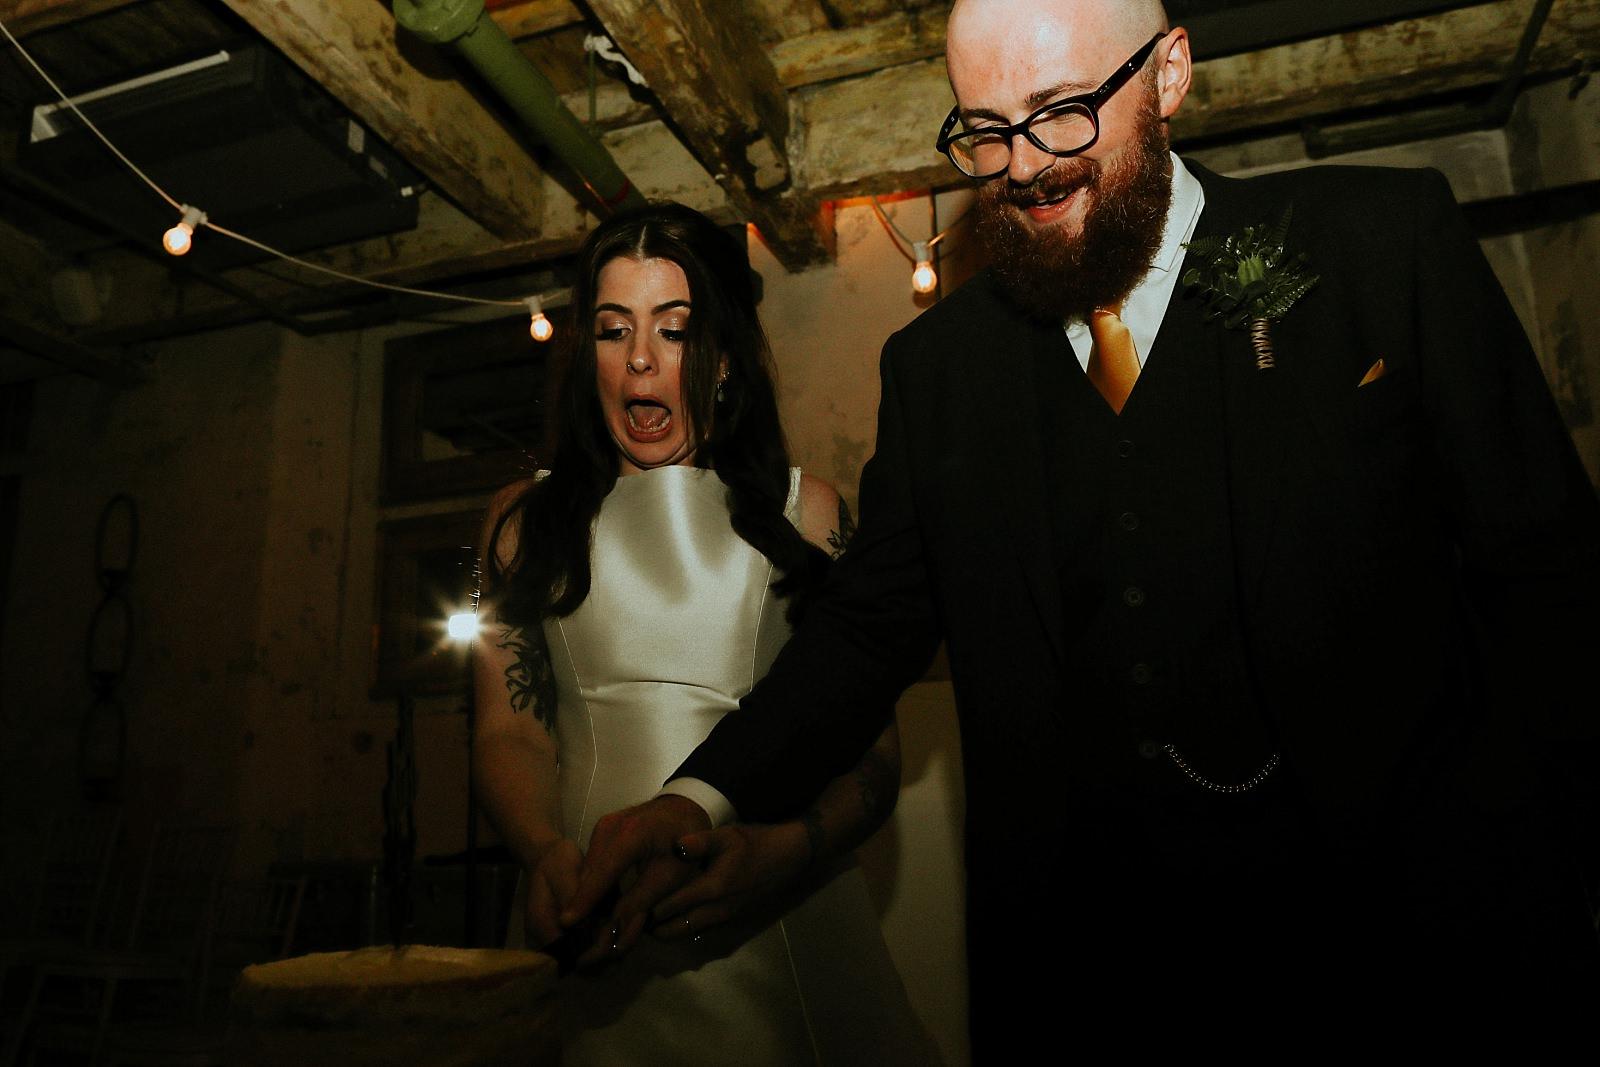 best reaction during wedding cake cutting